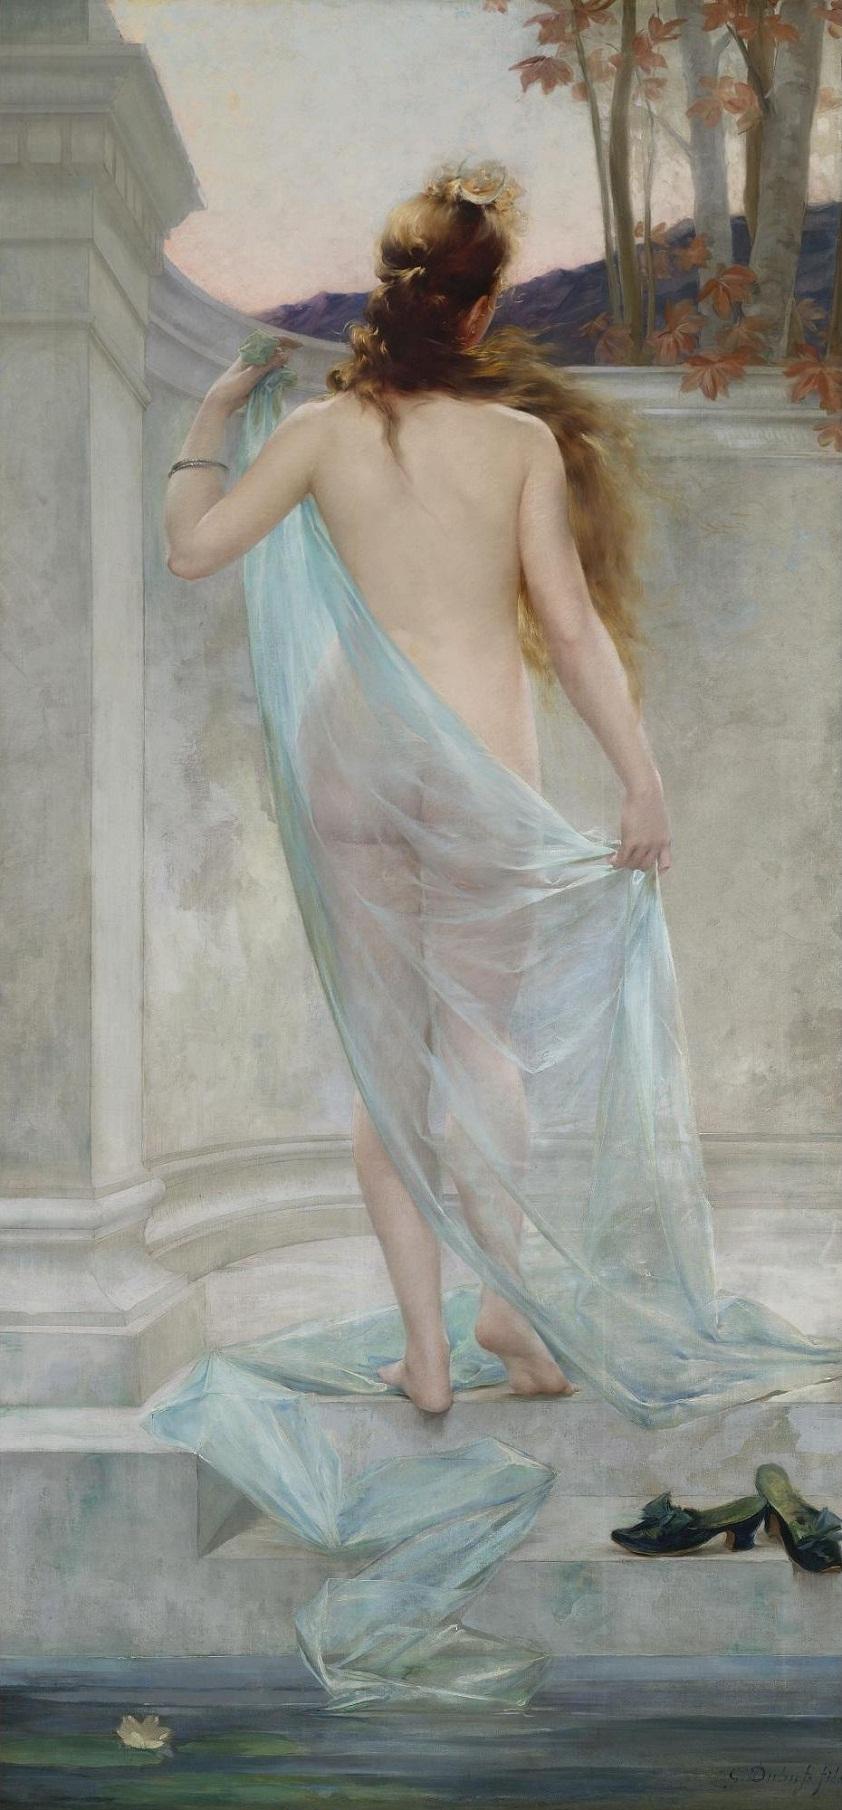 Édouard-Marie-Guillaume Dubufe FRENCH DIANA LEAVING HER BATH аукцион Сотбис